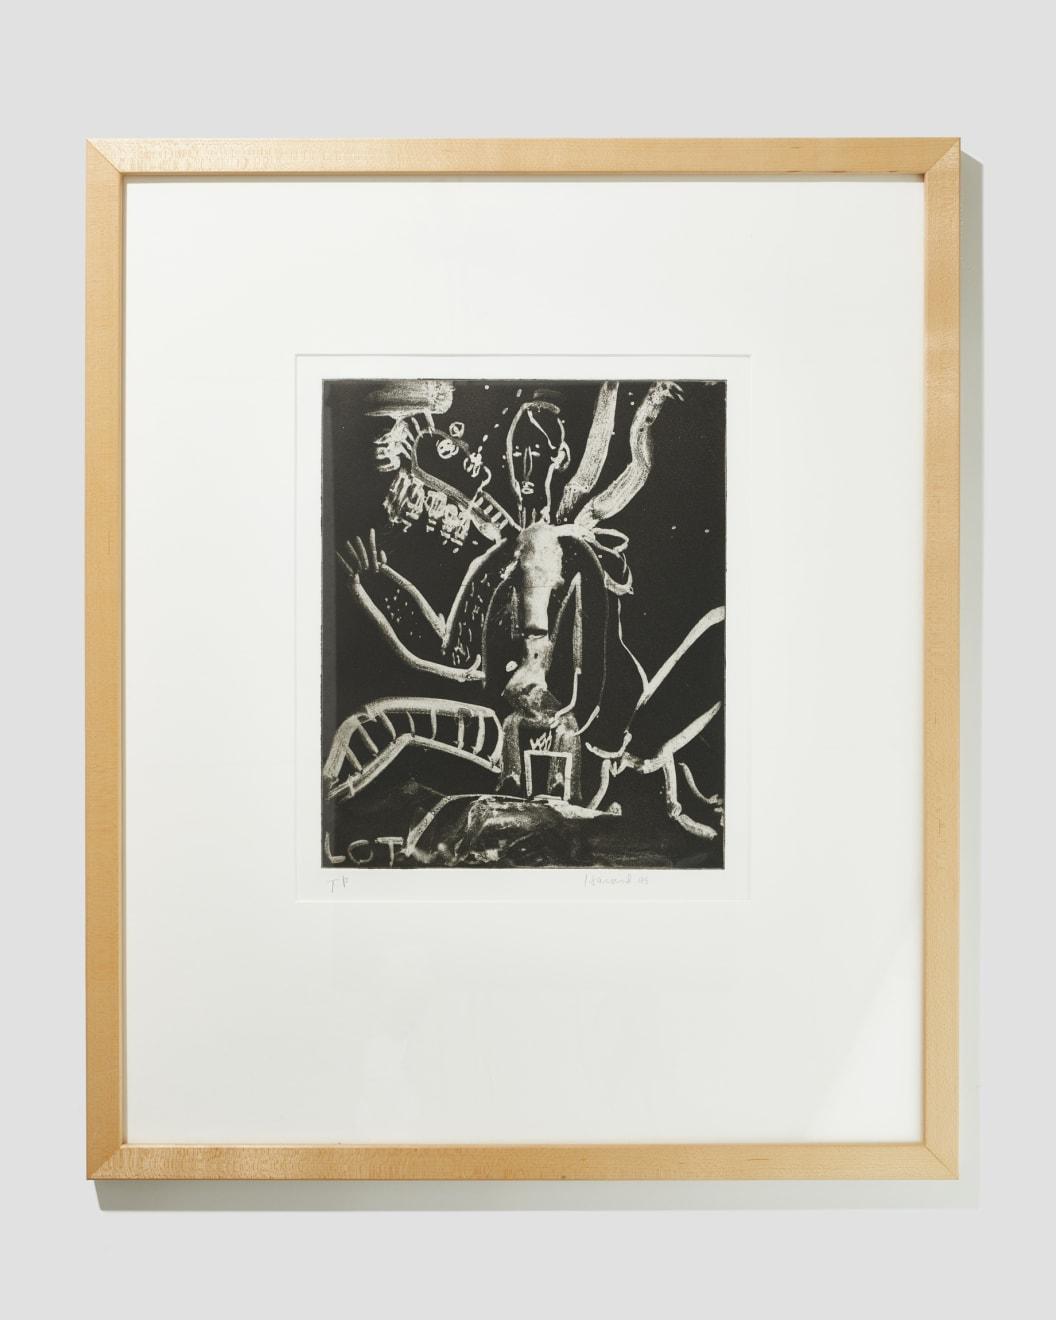 James Havard, Untitled T/P , 1995, Etching, 19 3/4 x 18 in, Starting Bid: $150. Courtesy of Zane Bennett Contemporary Art.